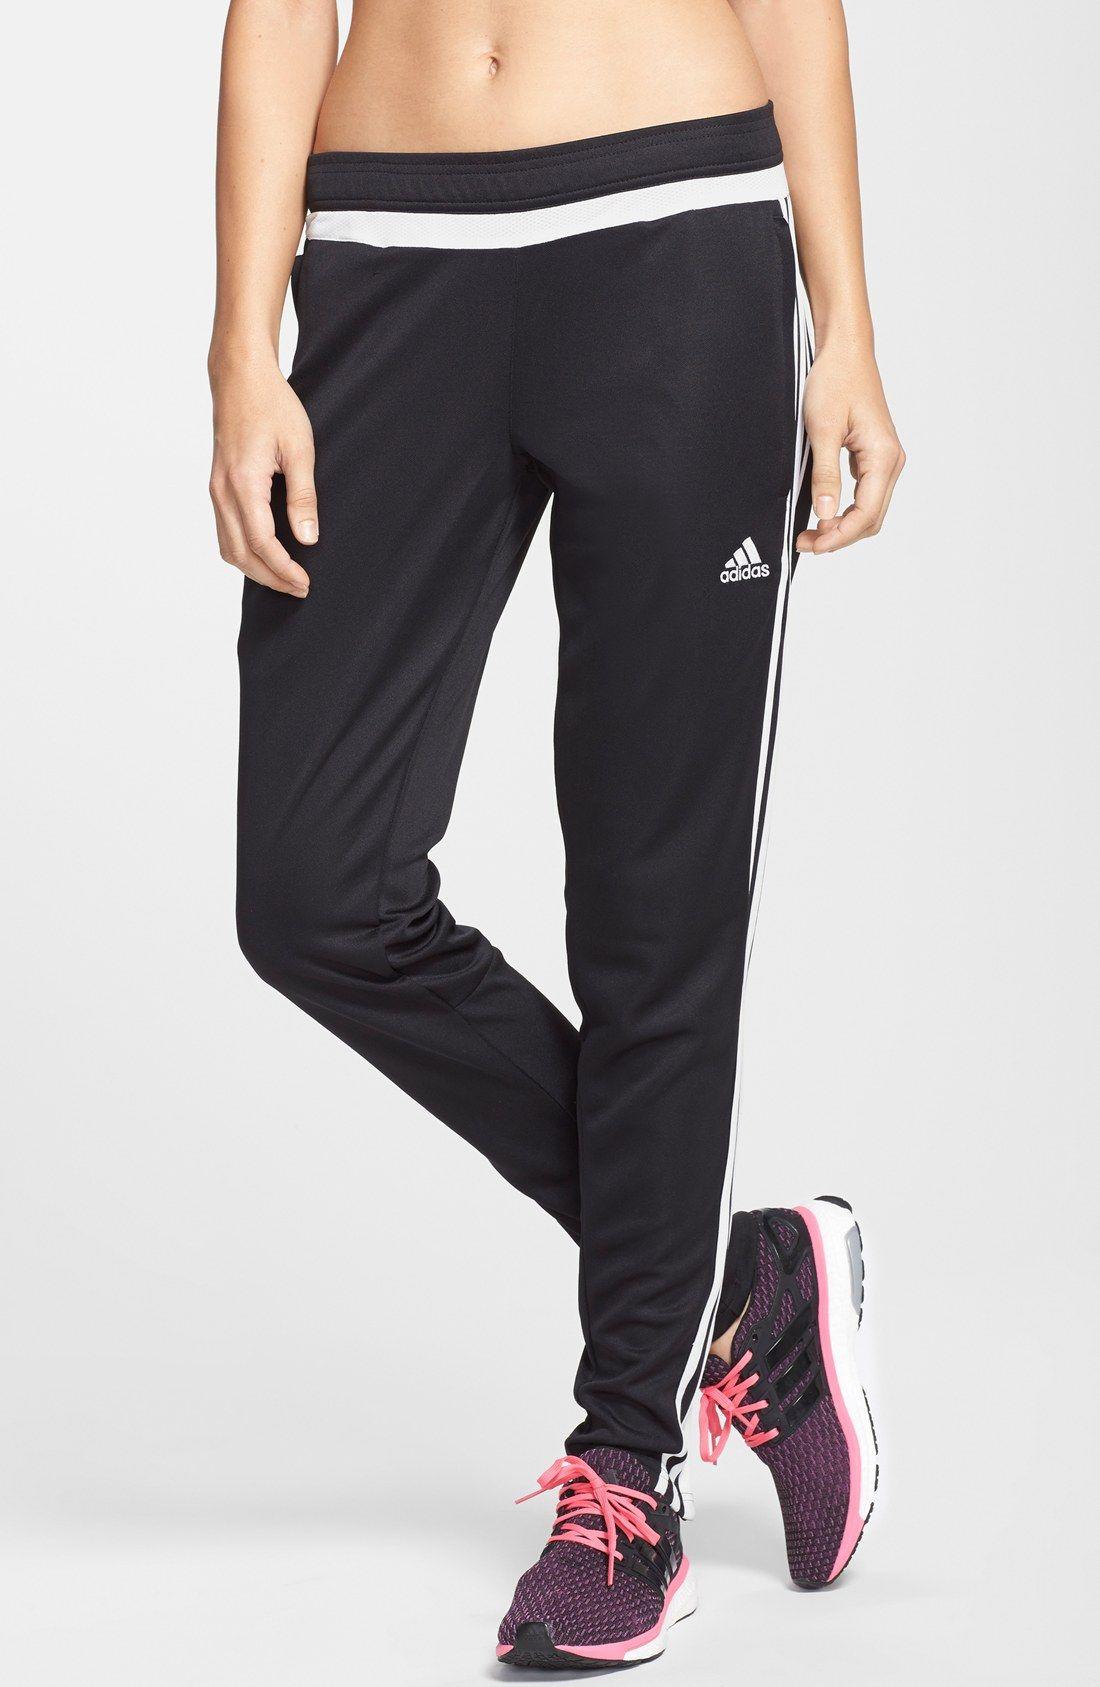 Stijl Training Pants Shoes De 15' 'tiro Adidas Adidas gqETZX4a